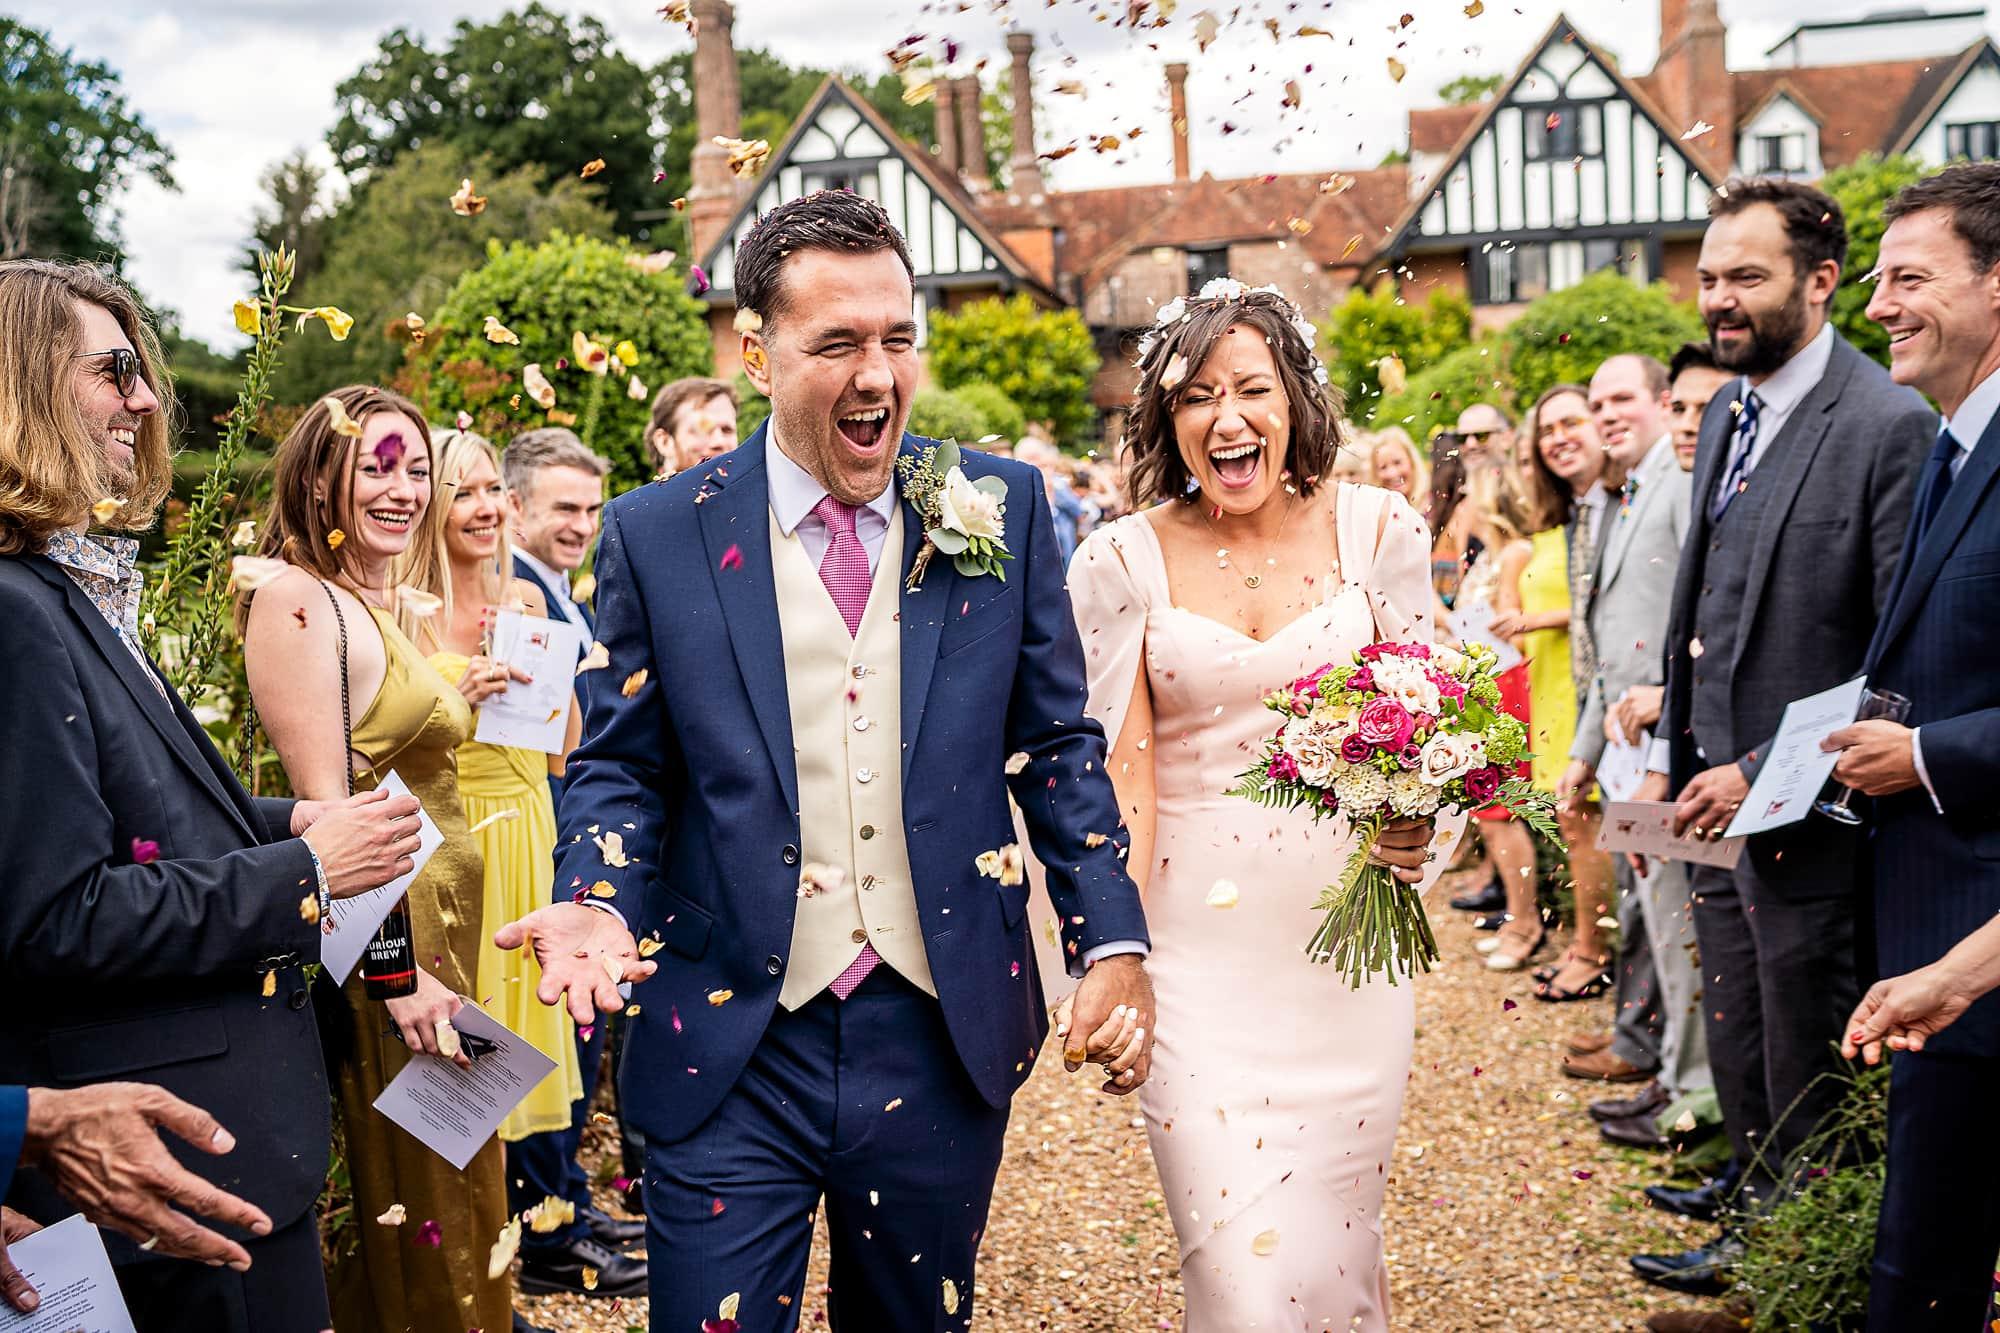 bride and groom walking through confetti at Brickwall house wedding venue Northiam Sussex